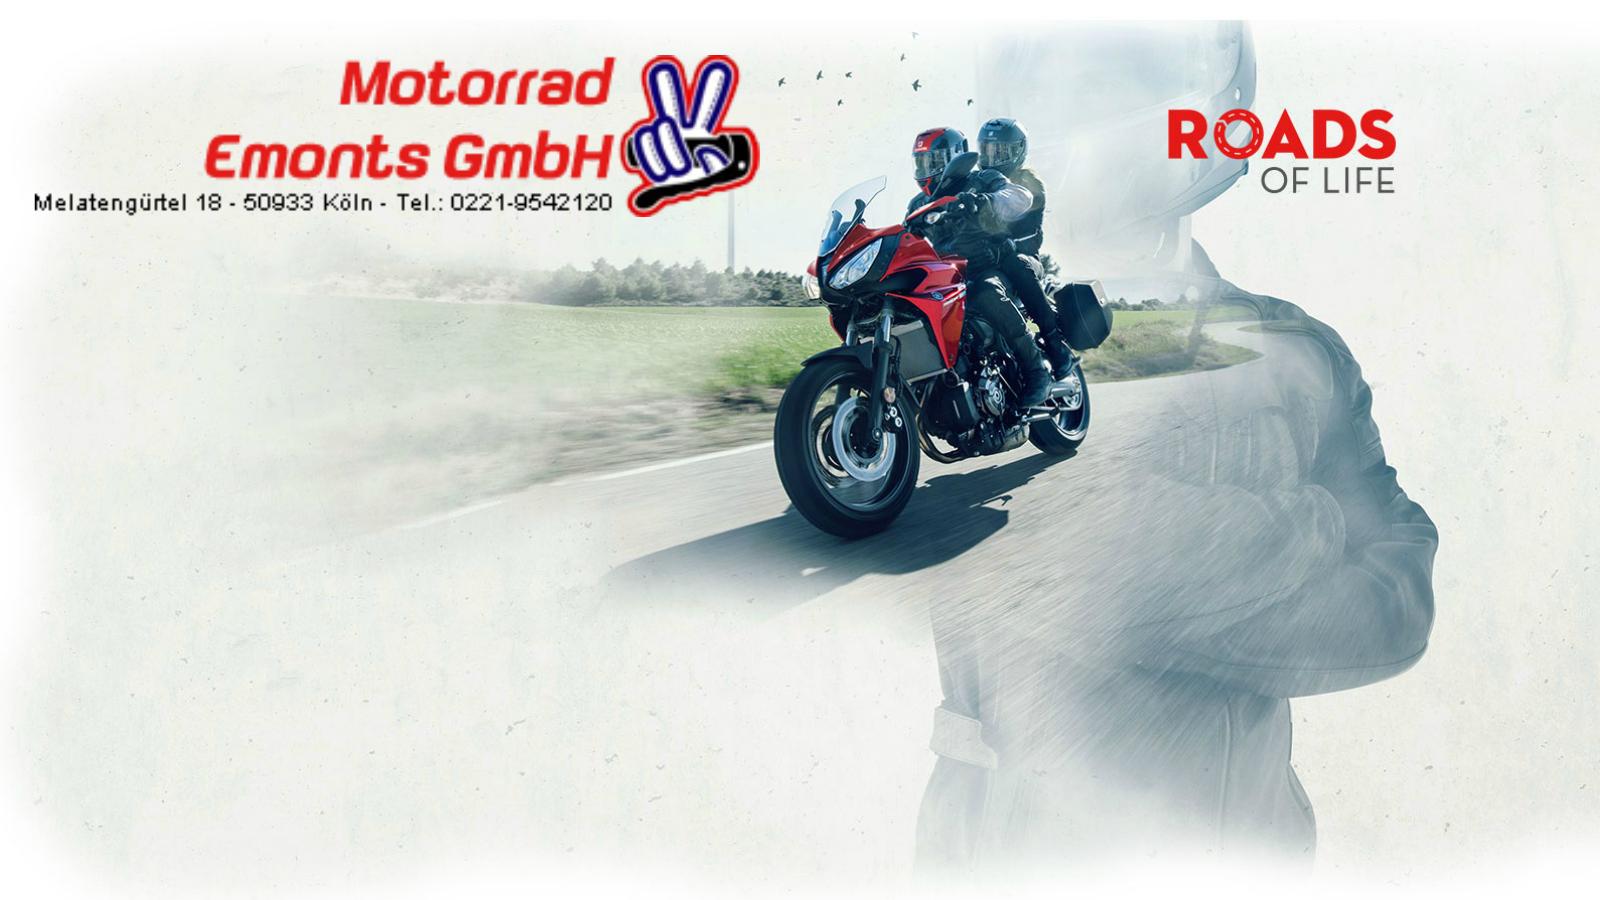 Motorrad Emonts GmbH